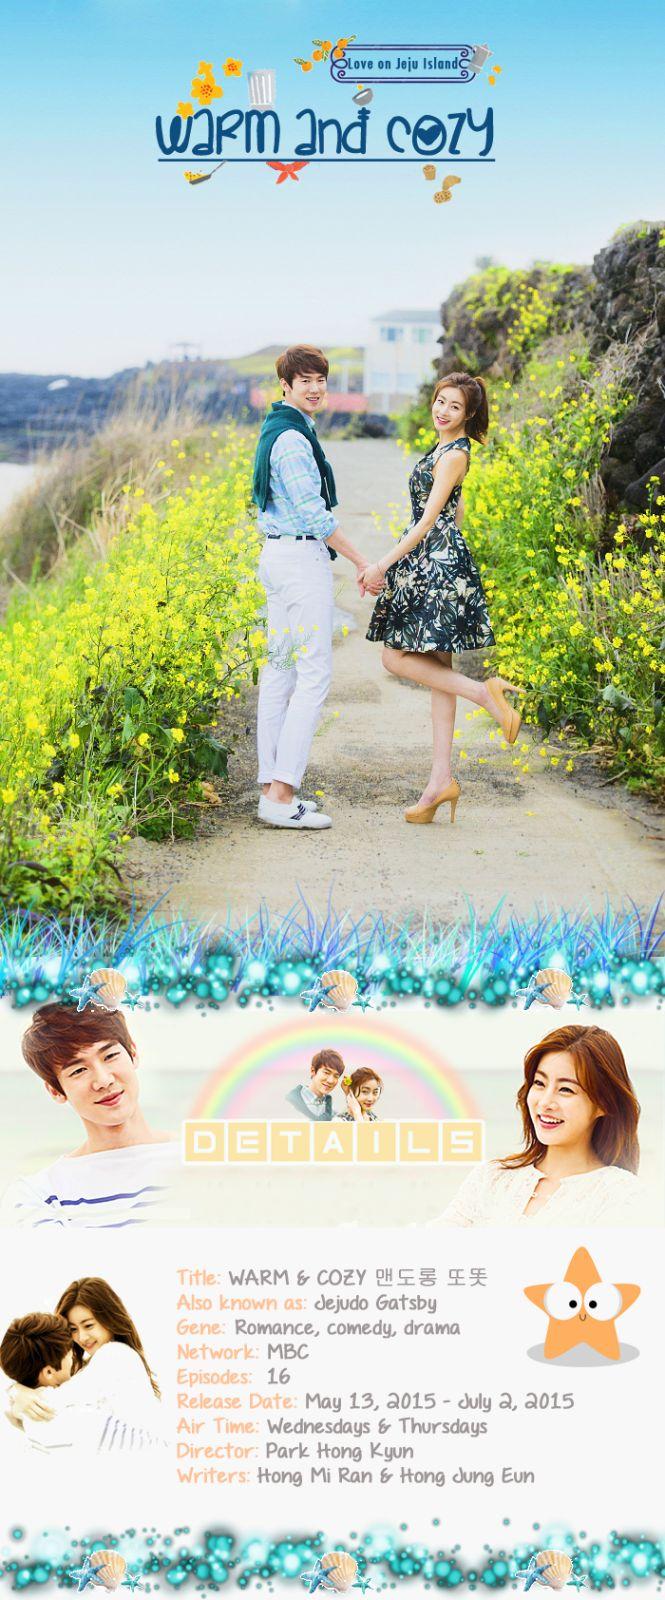 Autumn s concerto wallpaper - Autumn S Concerto Episode 1 Watch Full Episodes Free Taiwan K Drama Pinterest Watch Full Episodes